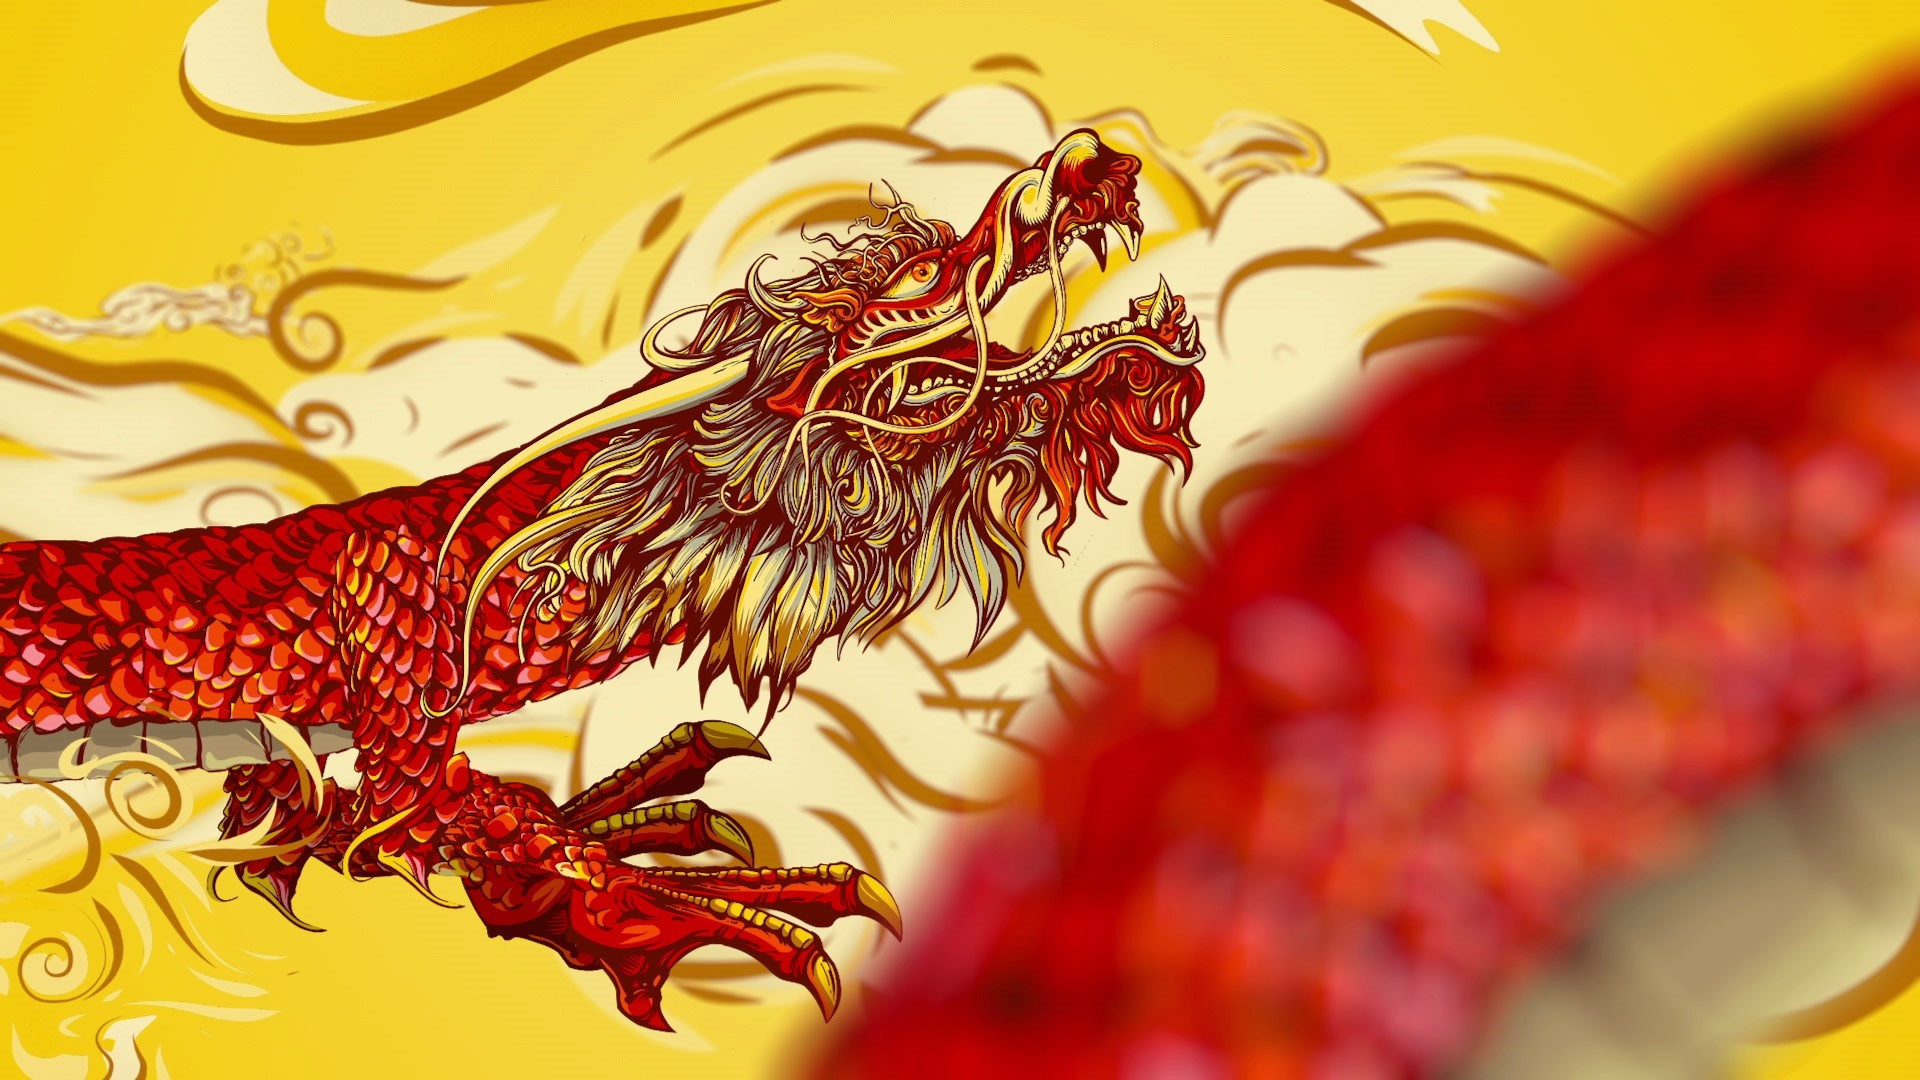 Chinese Dragon hd wallpaper download